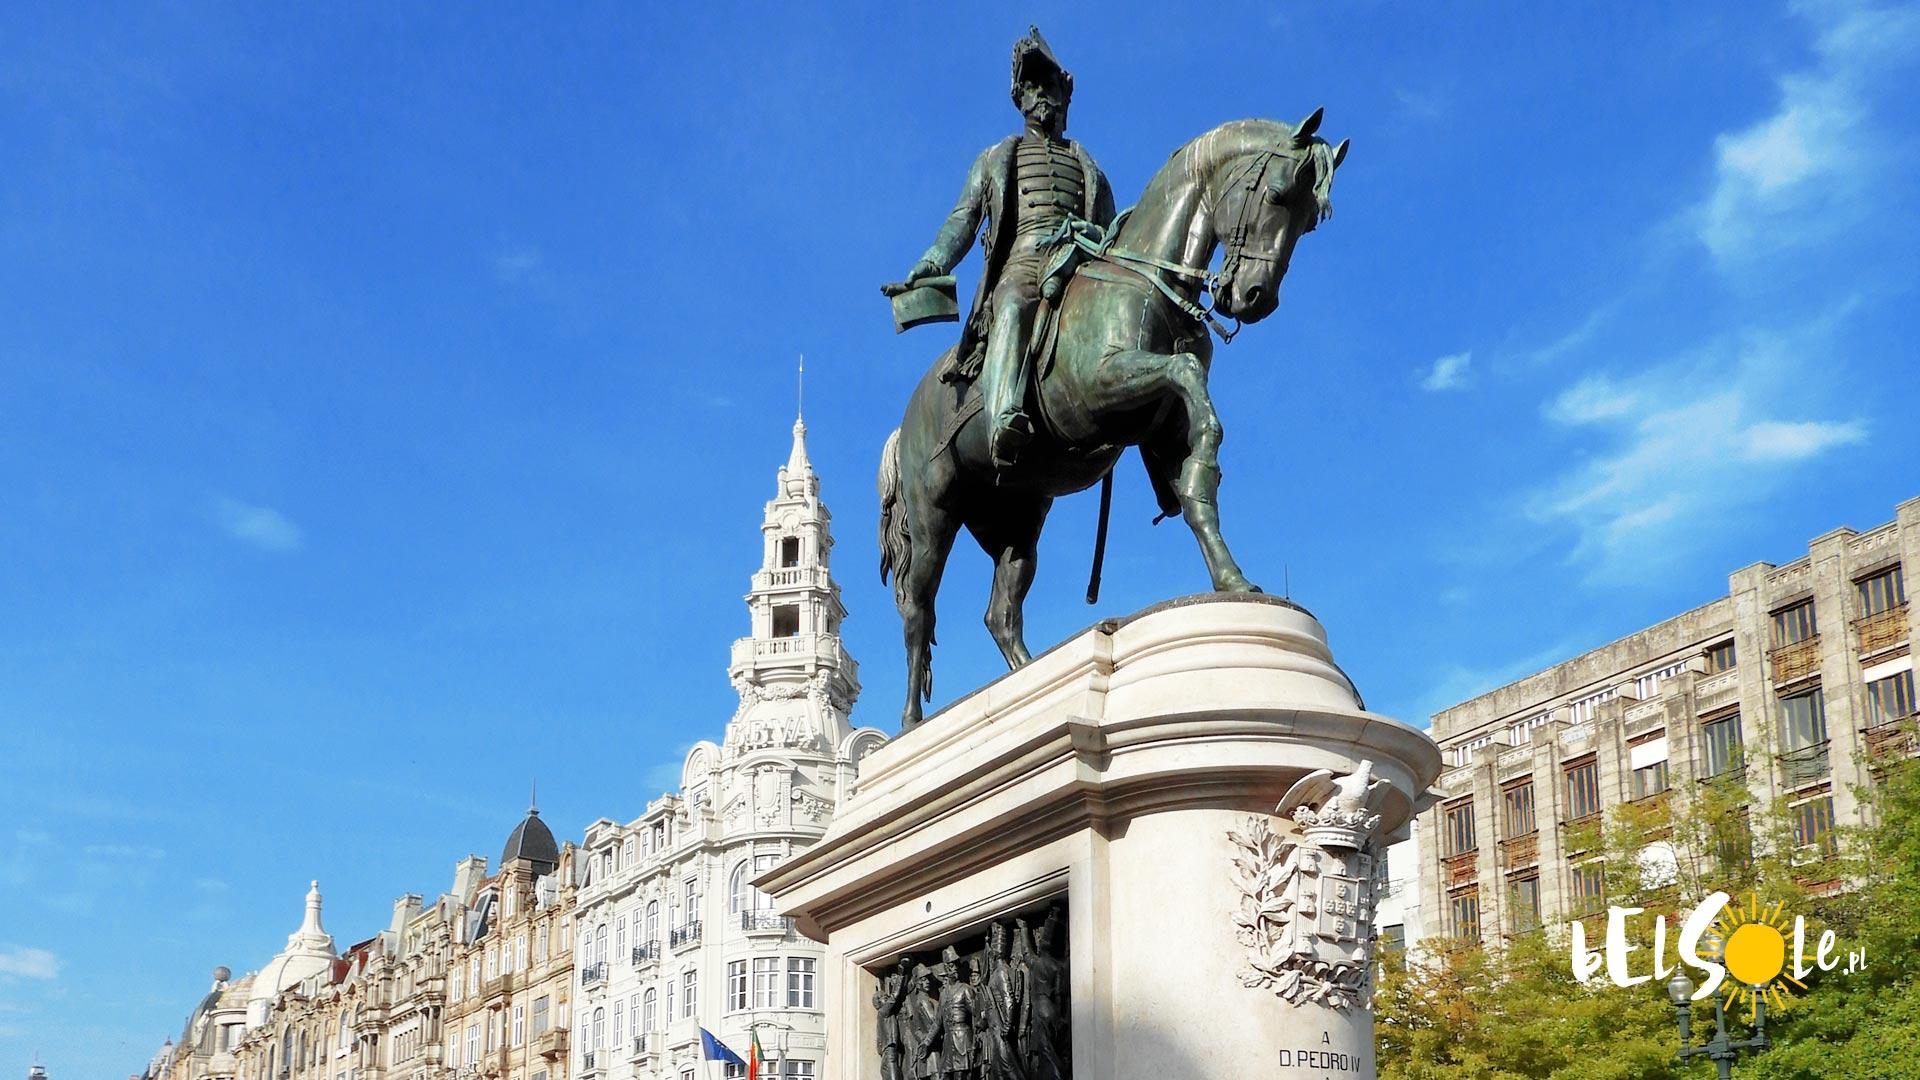 Pomnik Piotra I w Porto